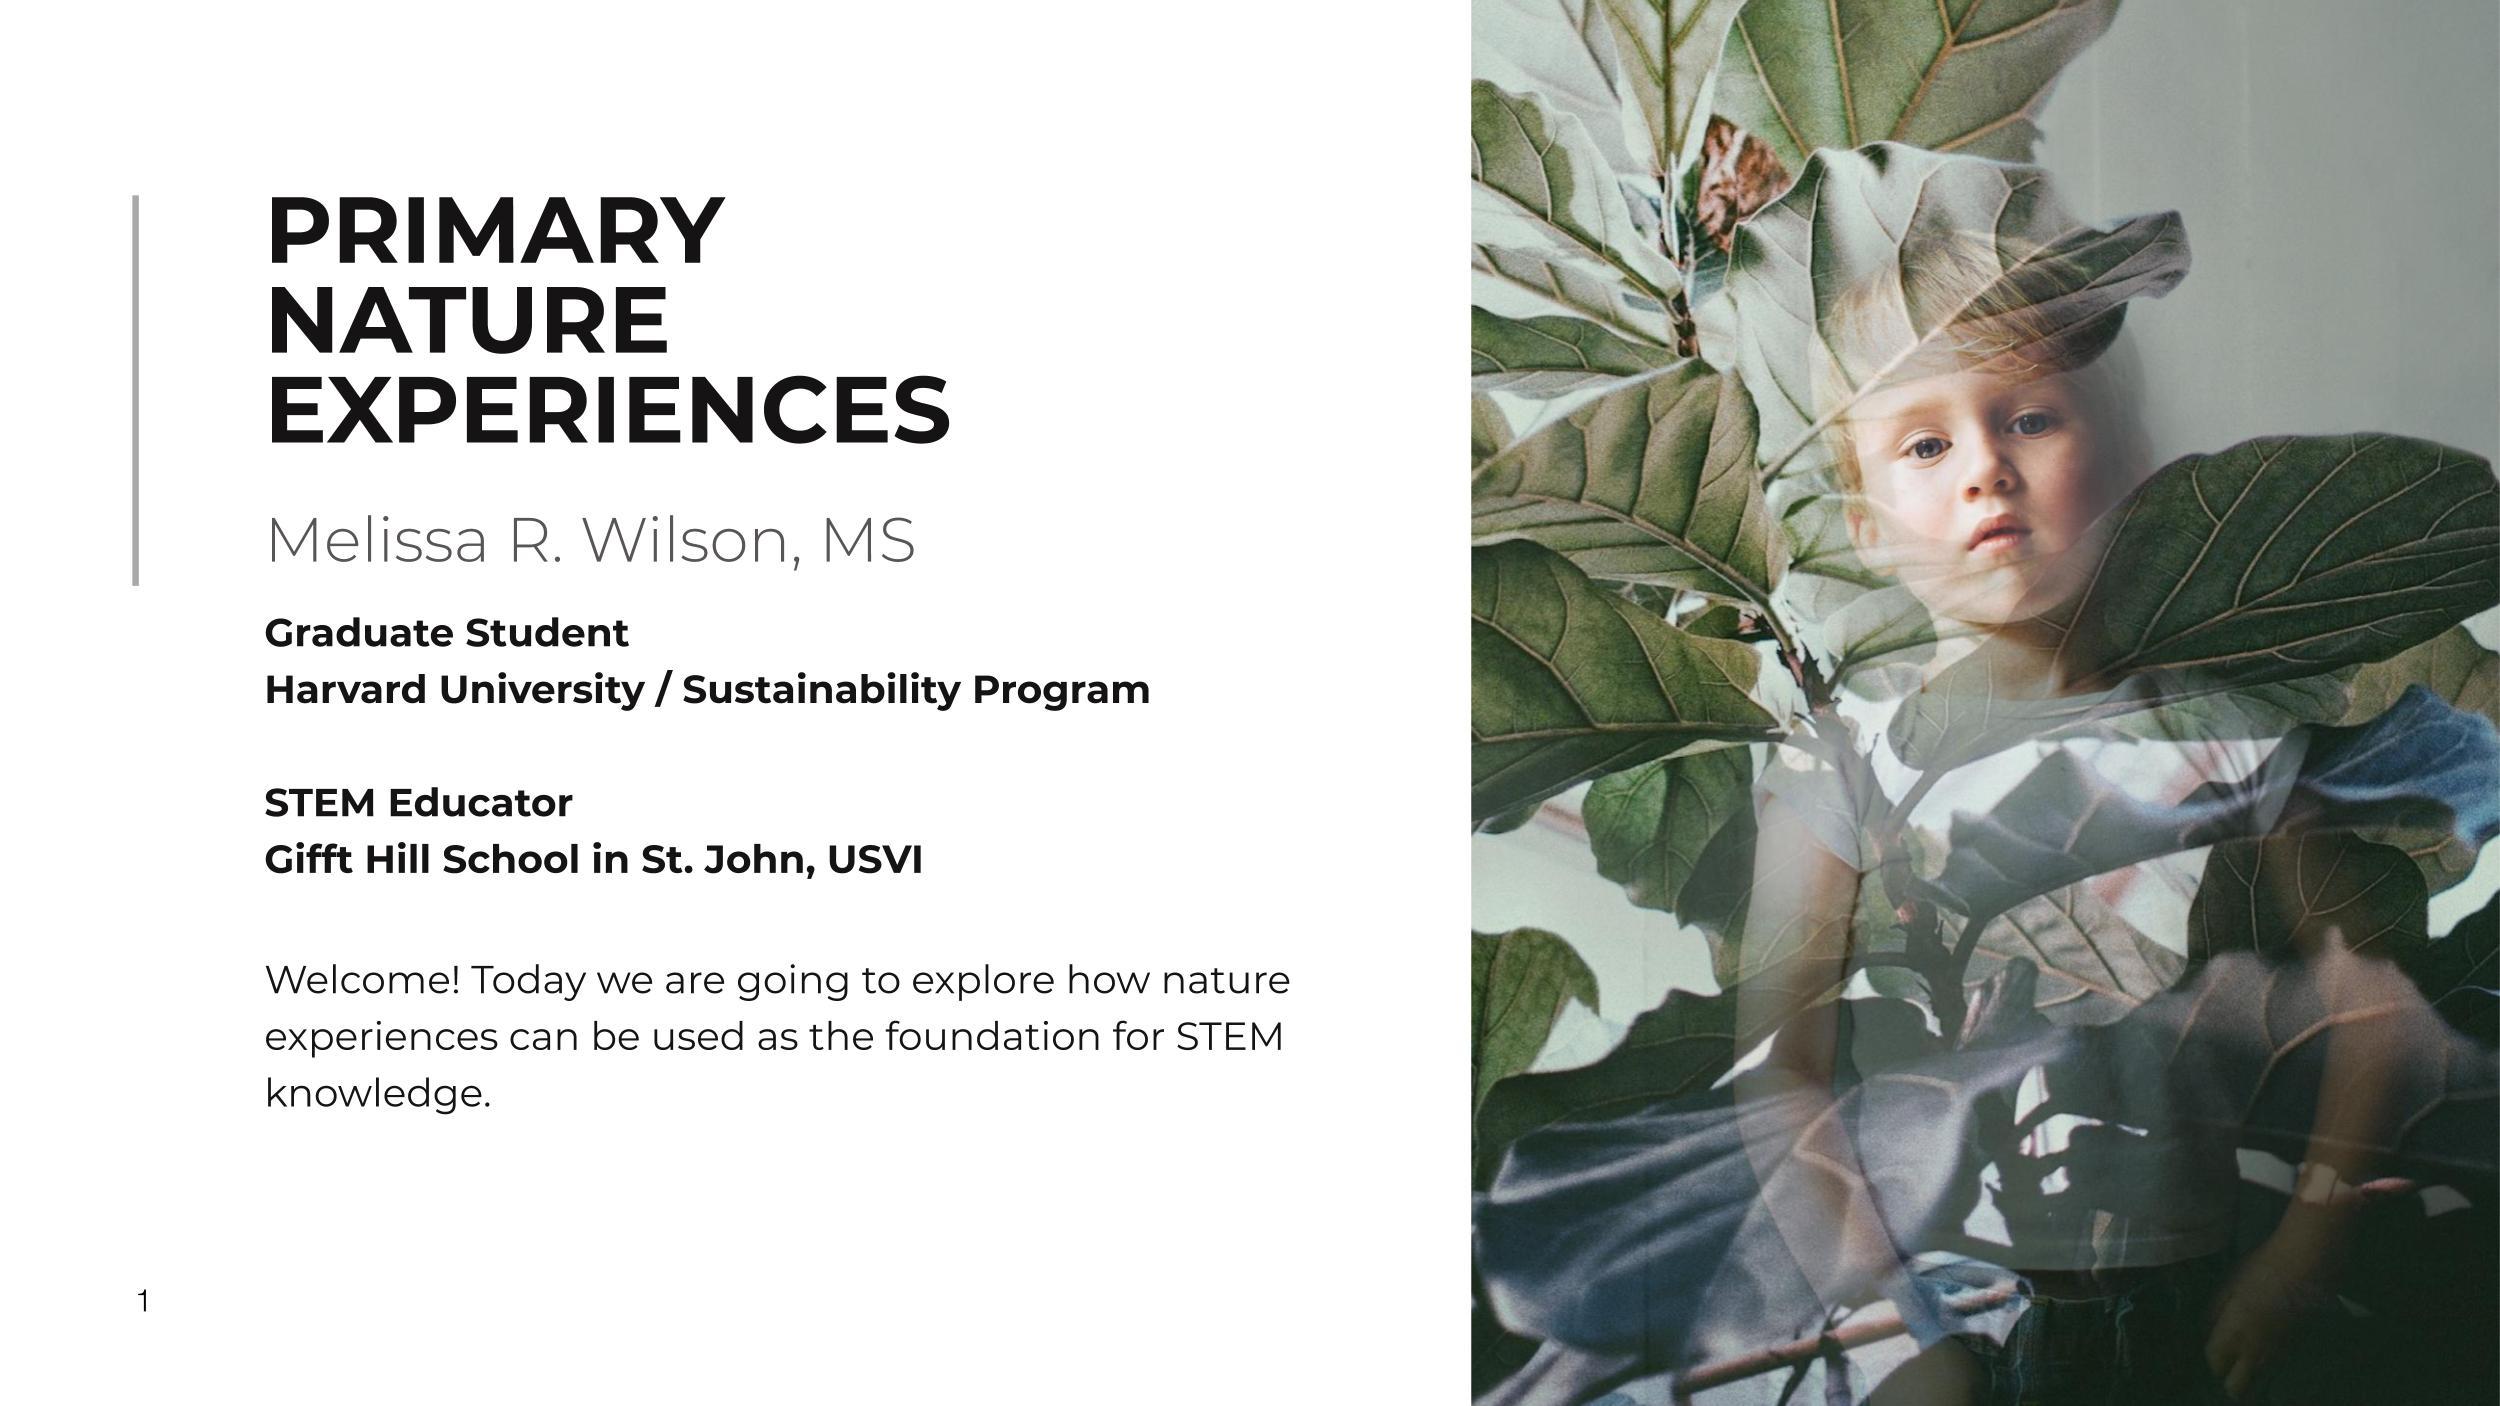 NAAEE Primary Nature Experience Presentation.jpg